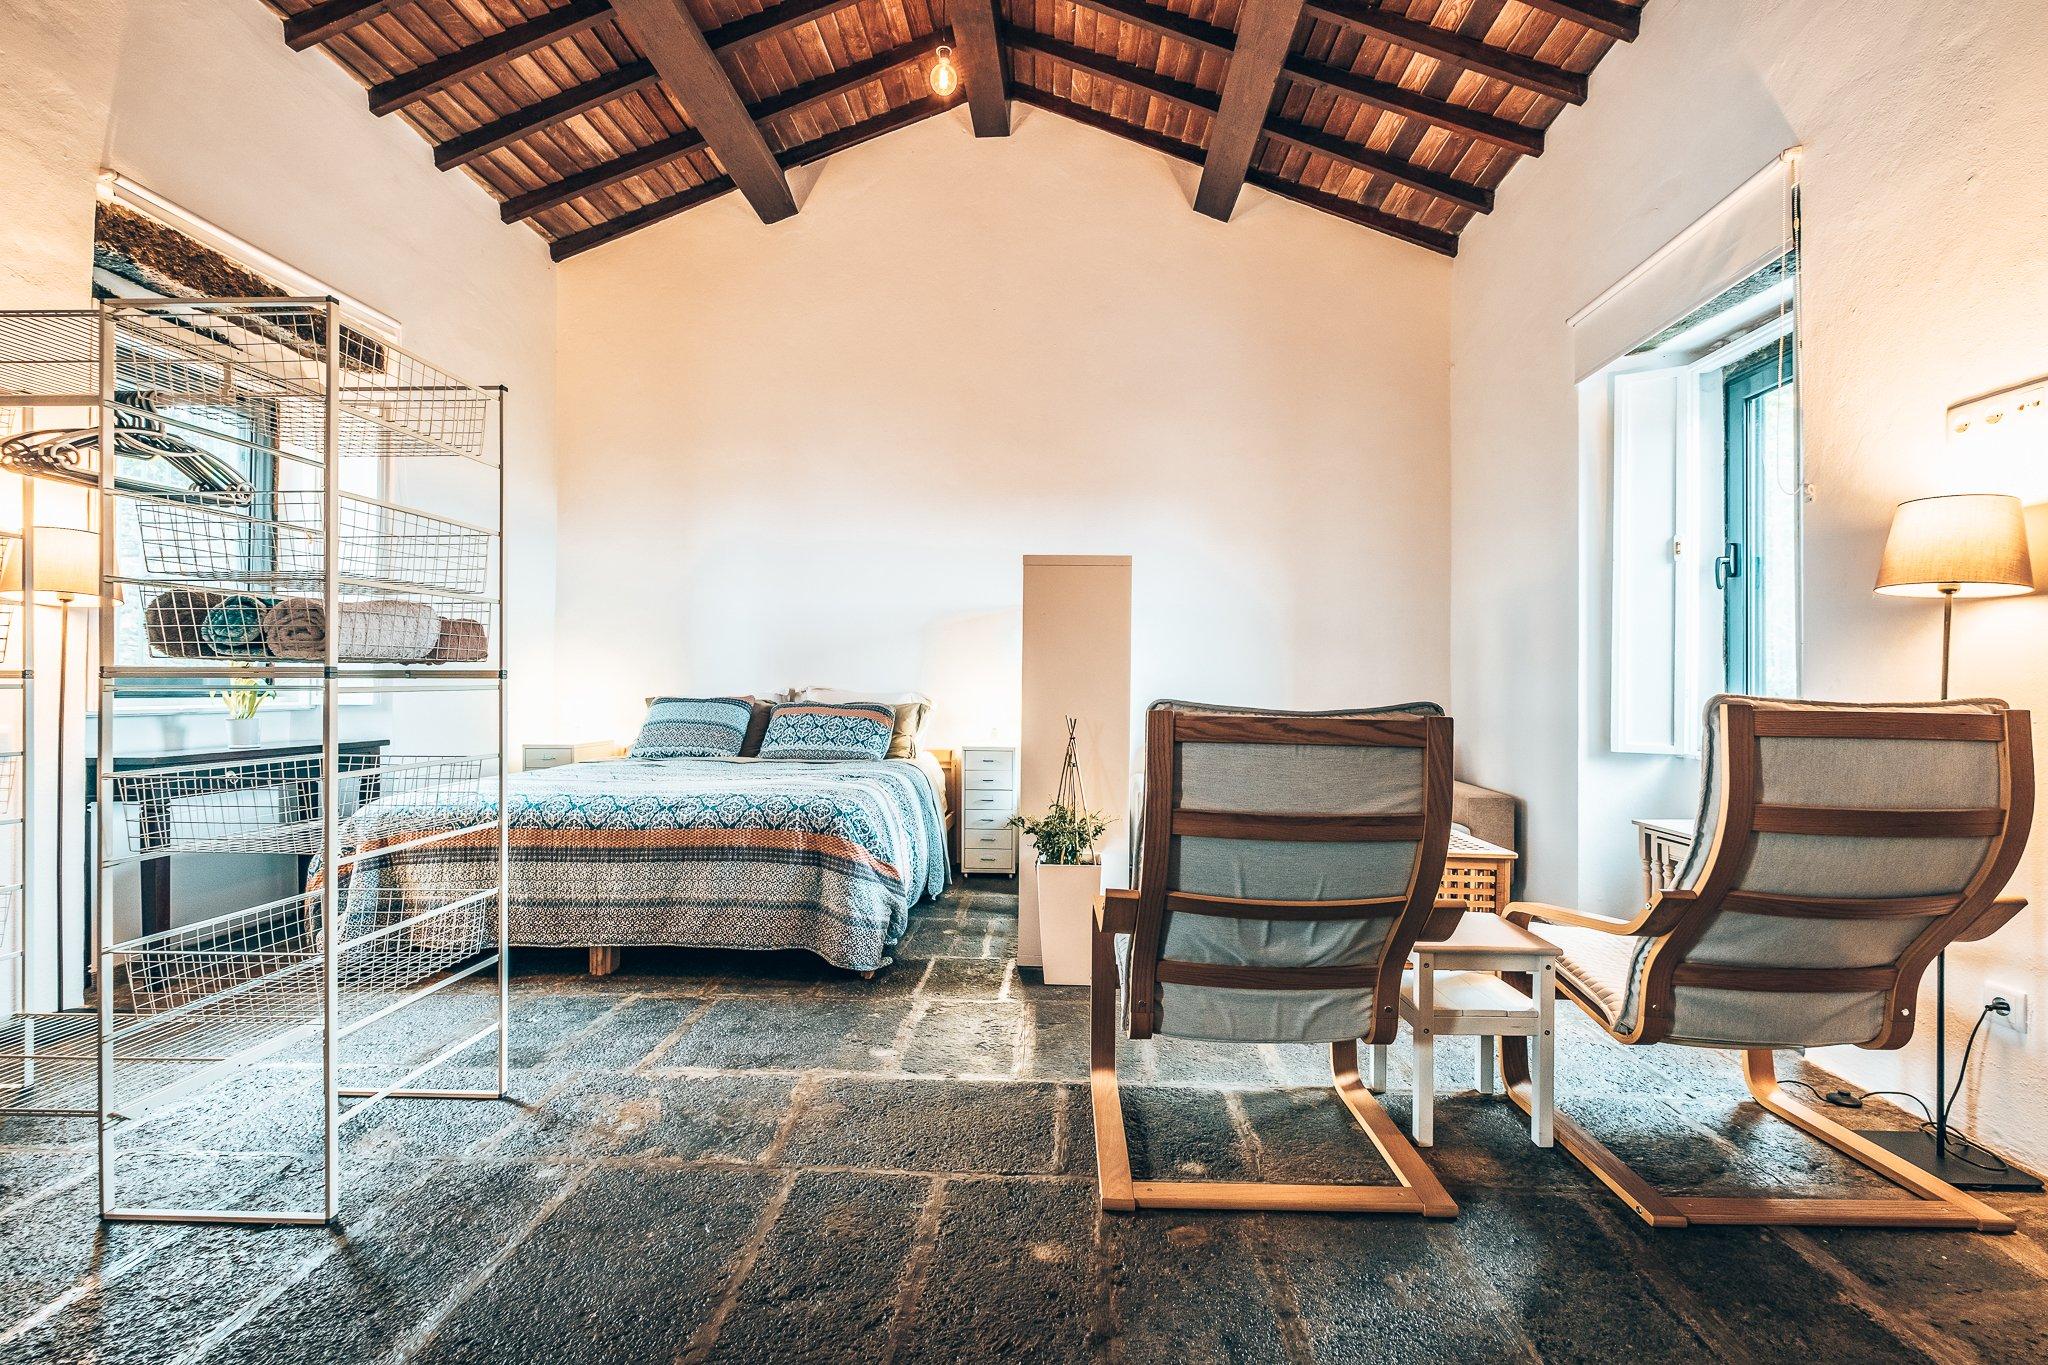 Kamer Solar Branco Eco Estate, Azoren, Alles over gin.